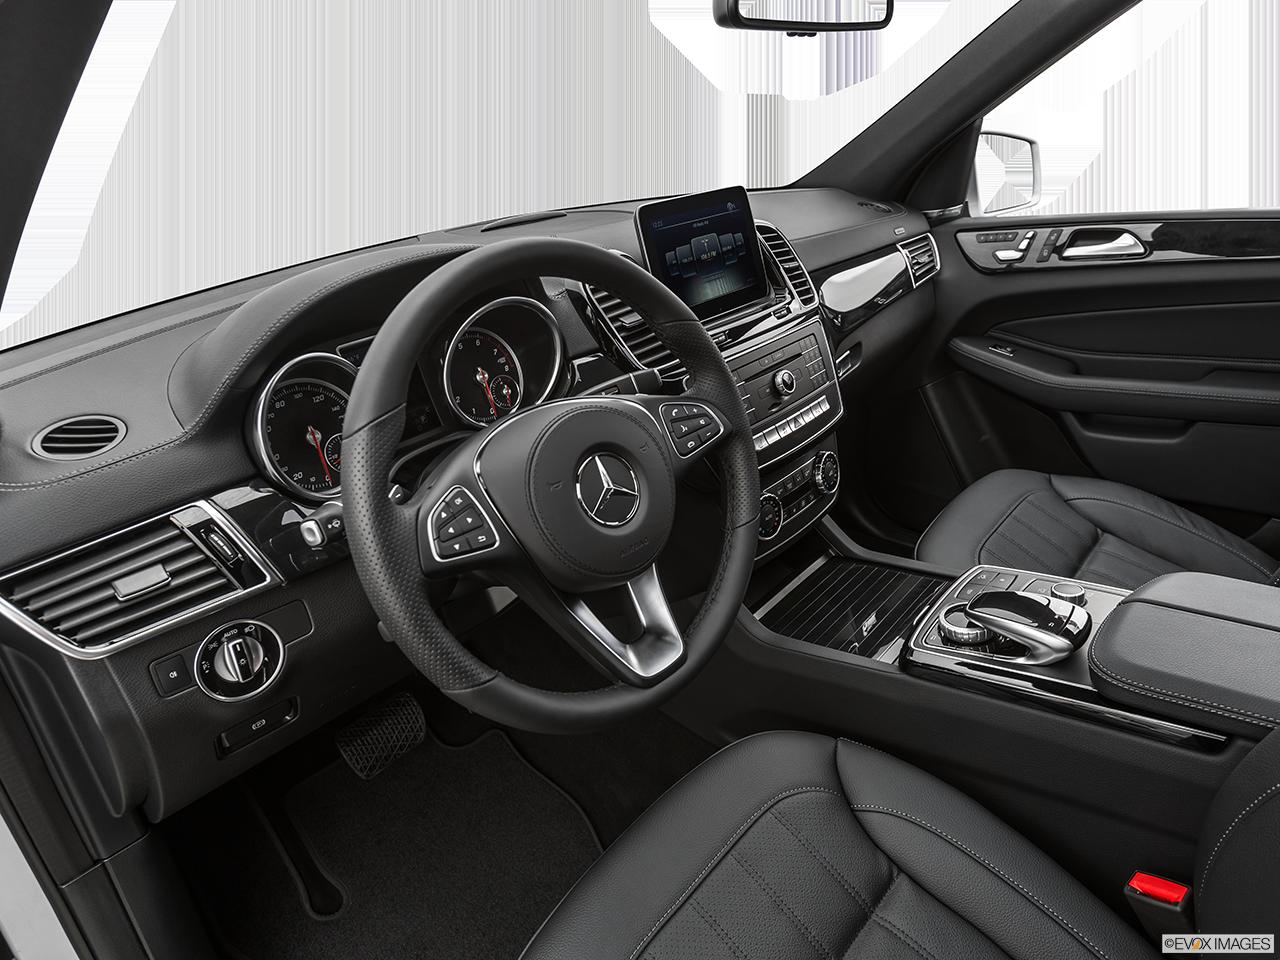 2019 Mercedes-Benz GLS photo